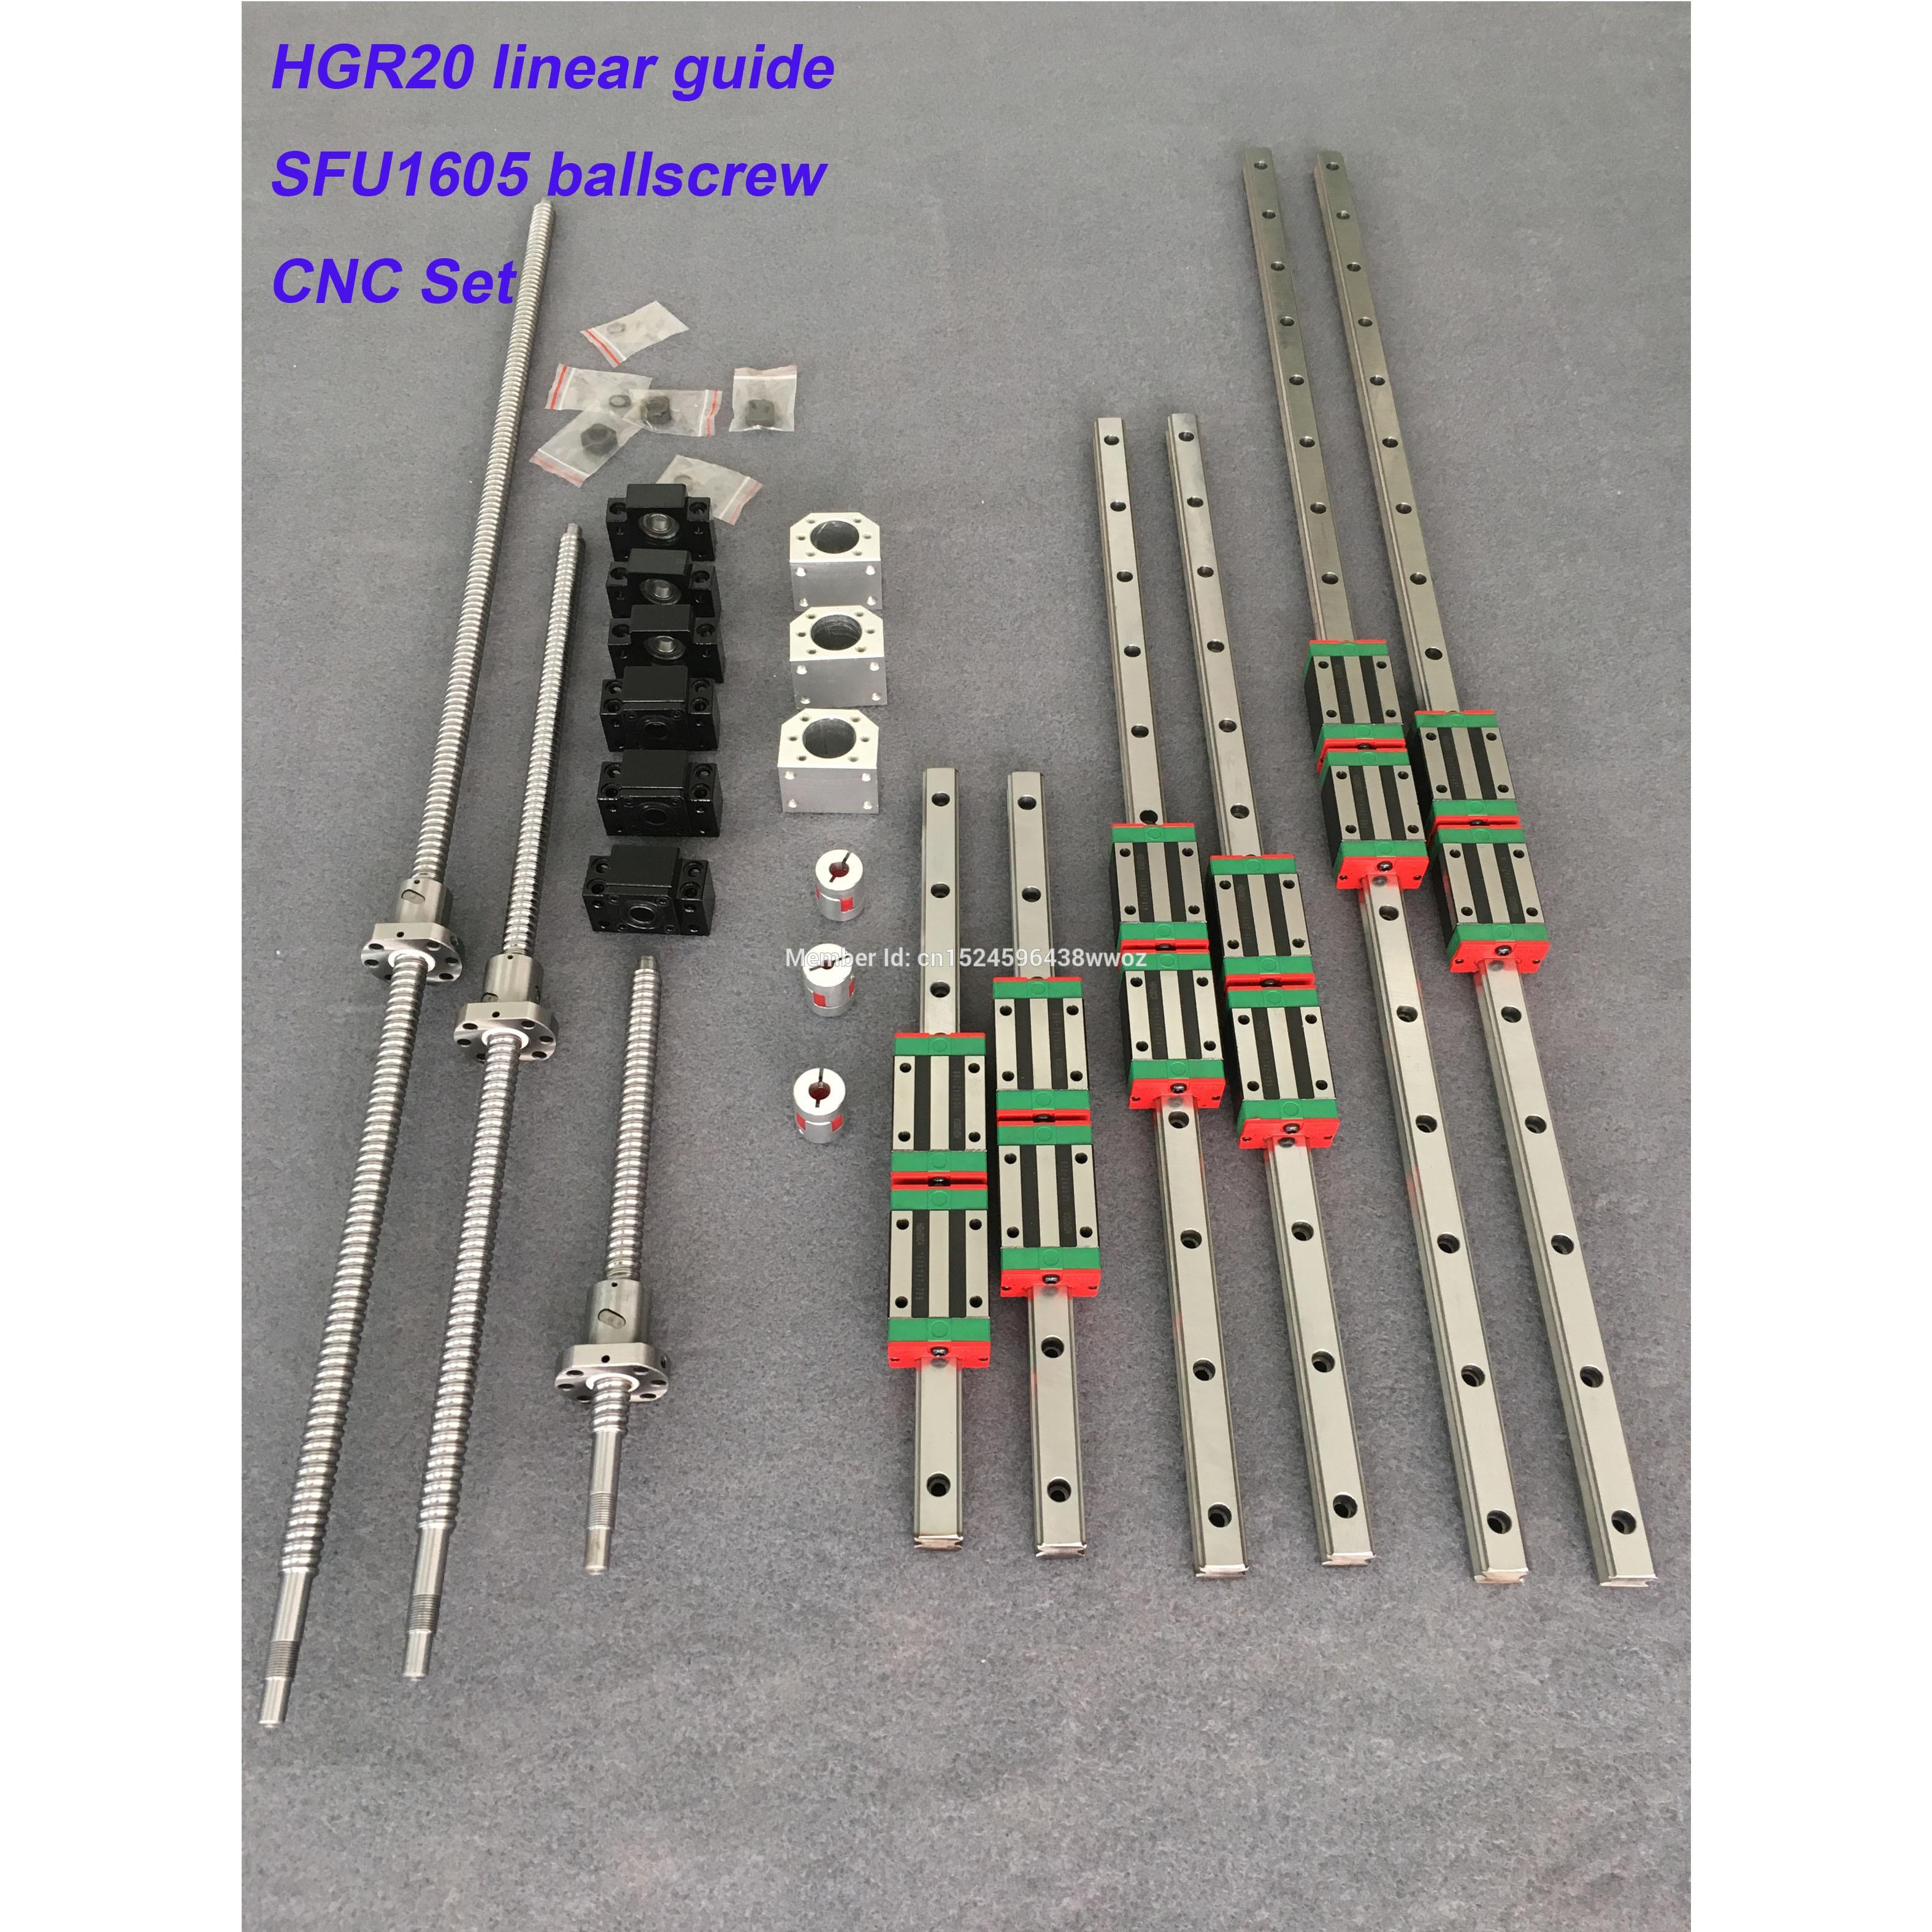 RU تسليم بالولب ساحة الخطي دليل السكك الحديدية 6 مجموعة HGR20 - 400/700/1000 مللي متر + SFU1605 - 400/700/1000 مللي متر + BK/BF12 نك جزء